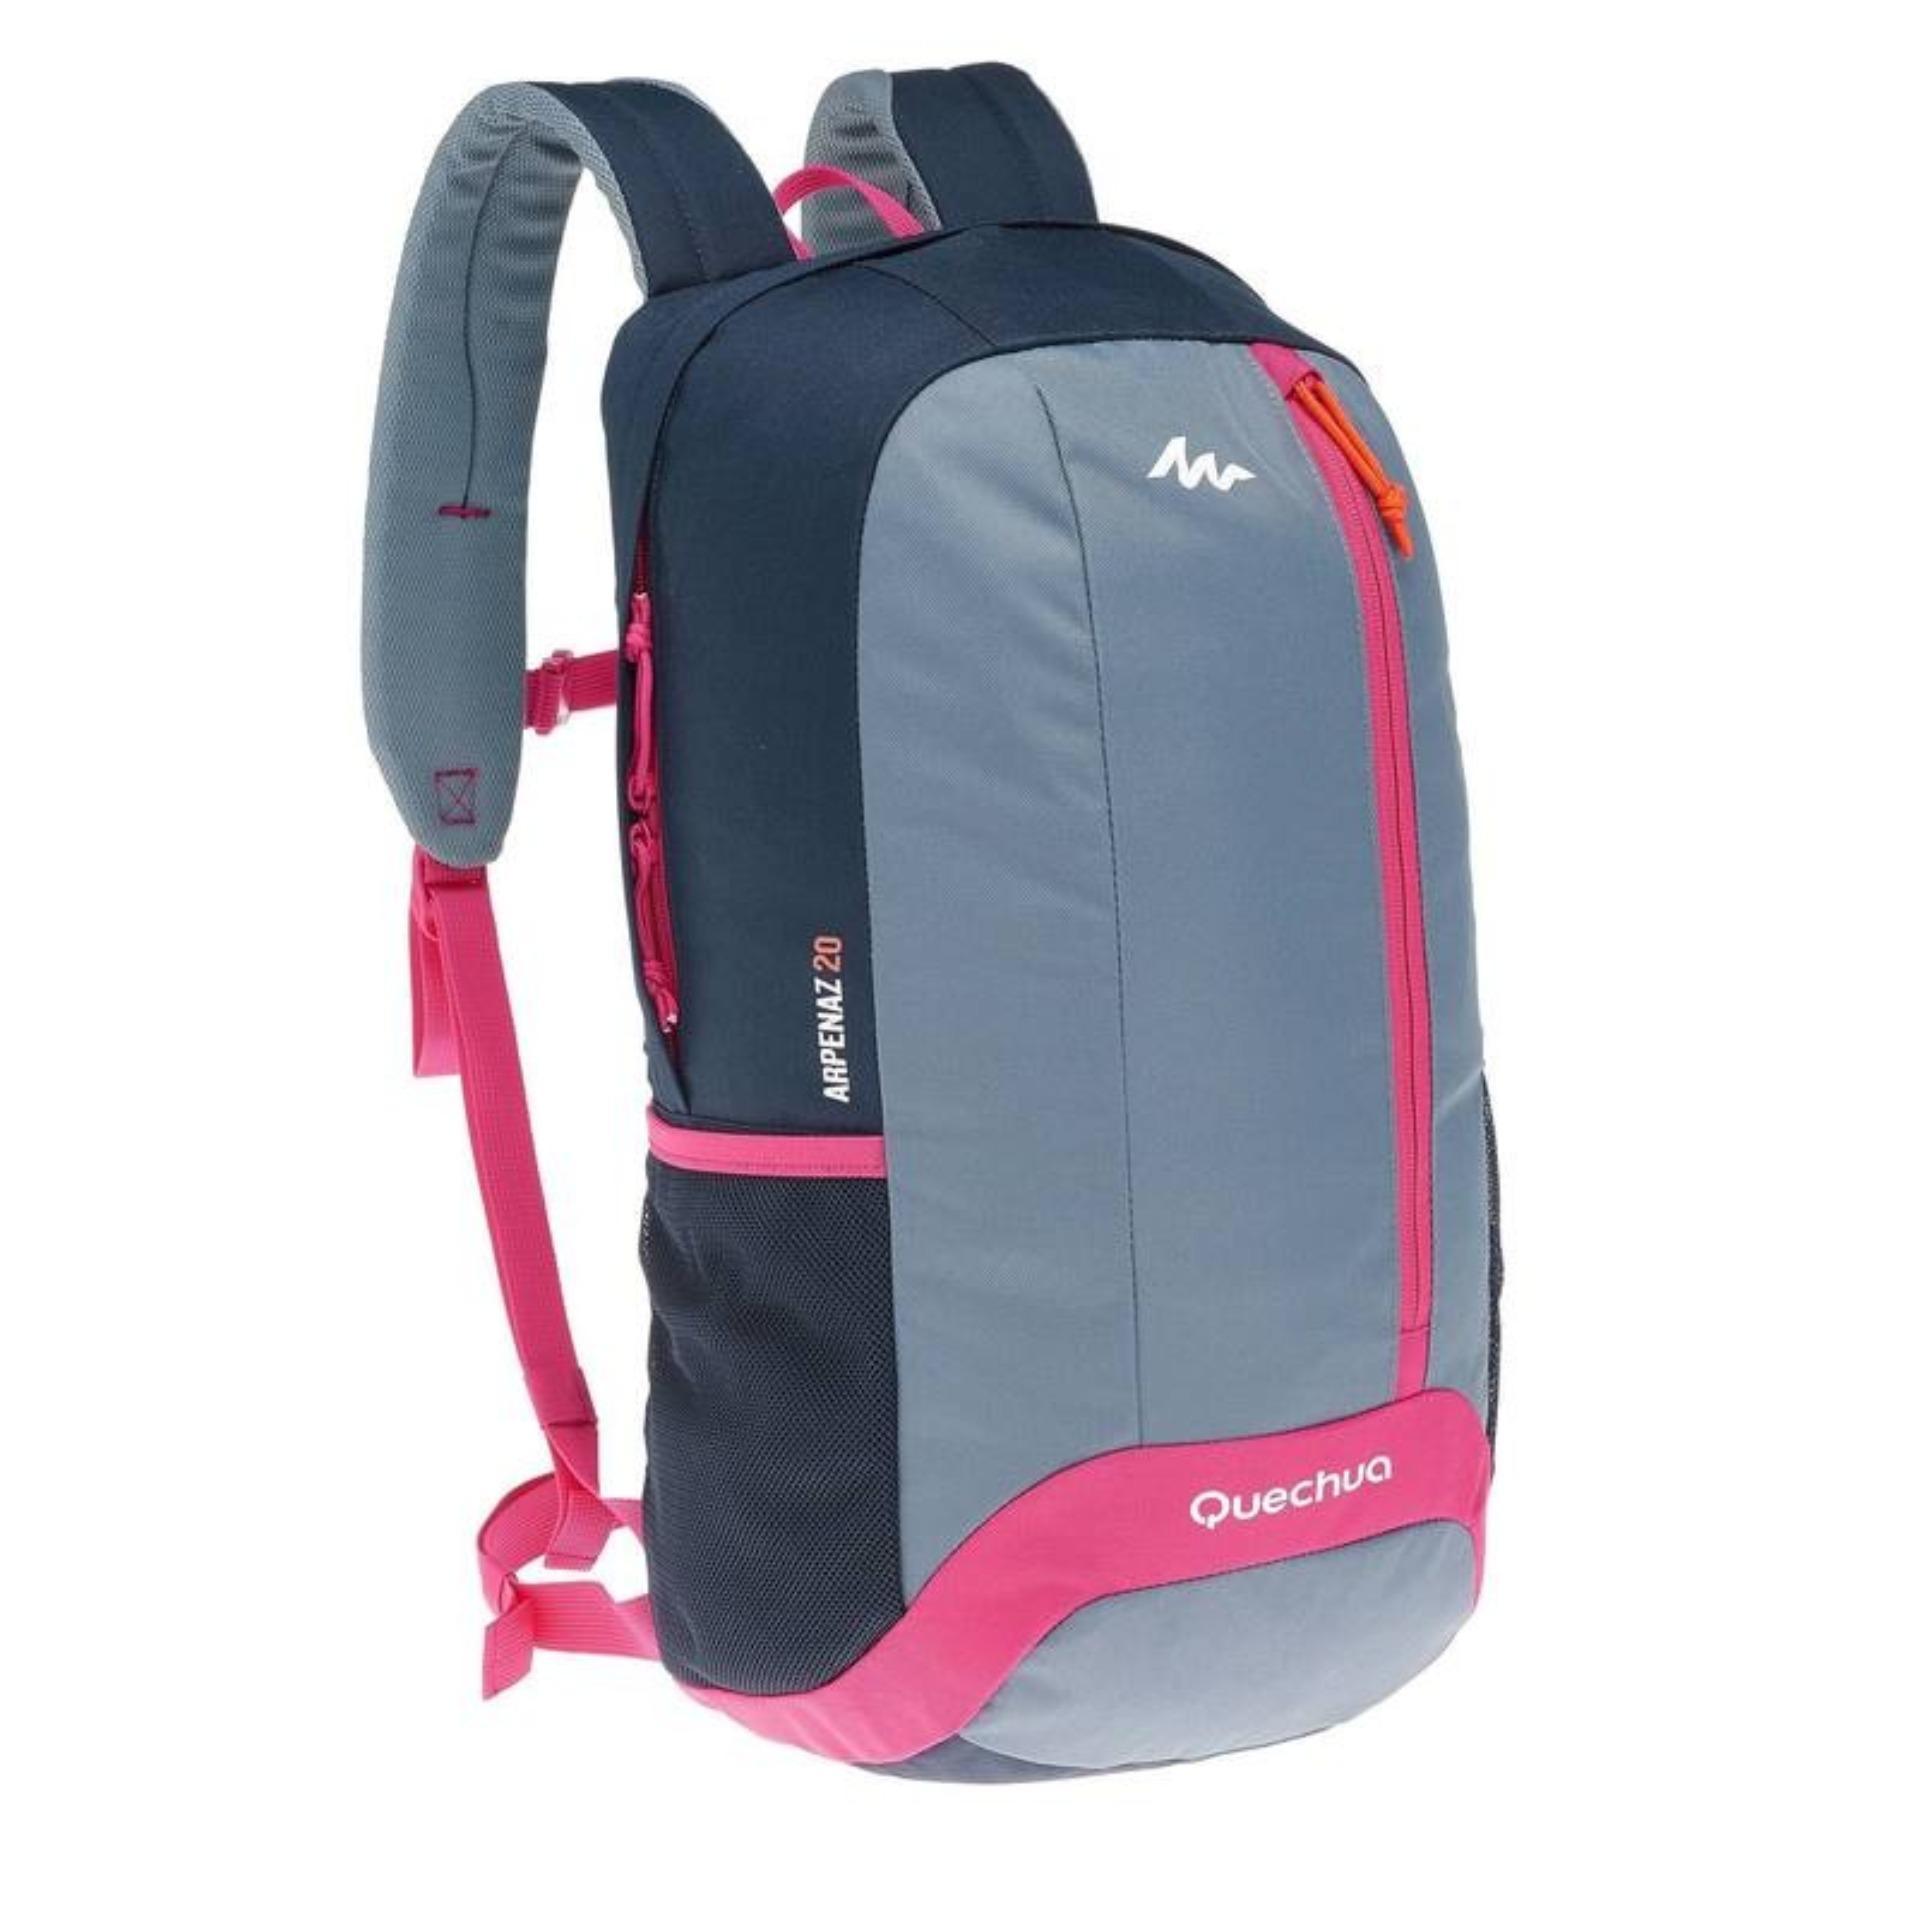 Polo Line Tas Ransel Laptop Backpack 8054 Black Real Kasual 6363 Hijau Free Bag Cover Decathlon Quechua 20l